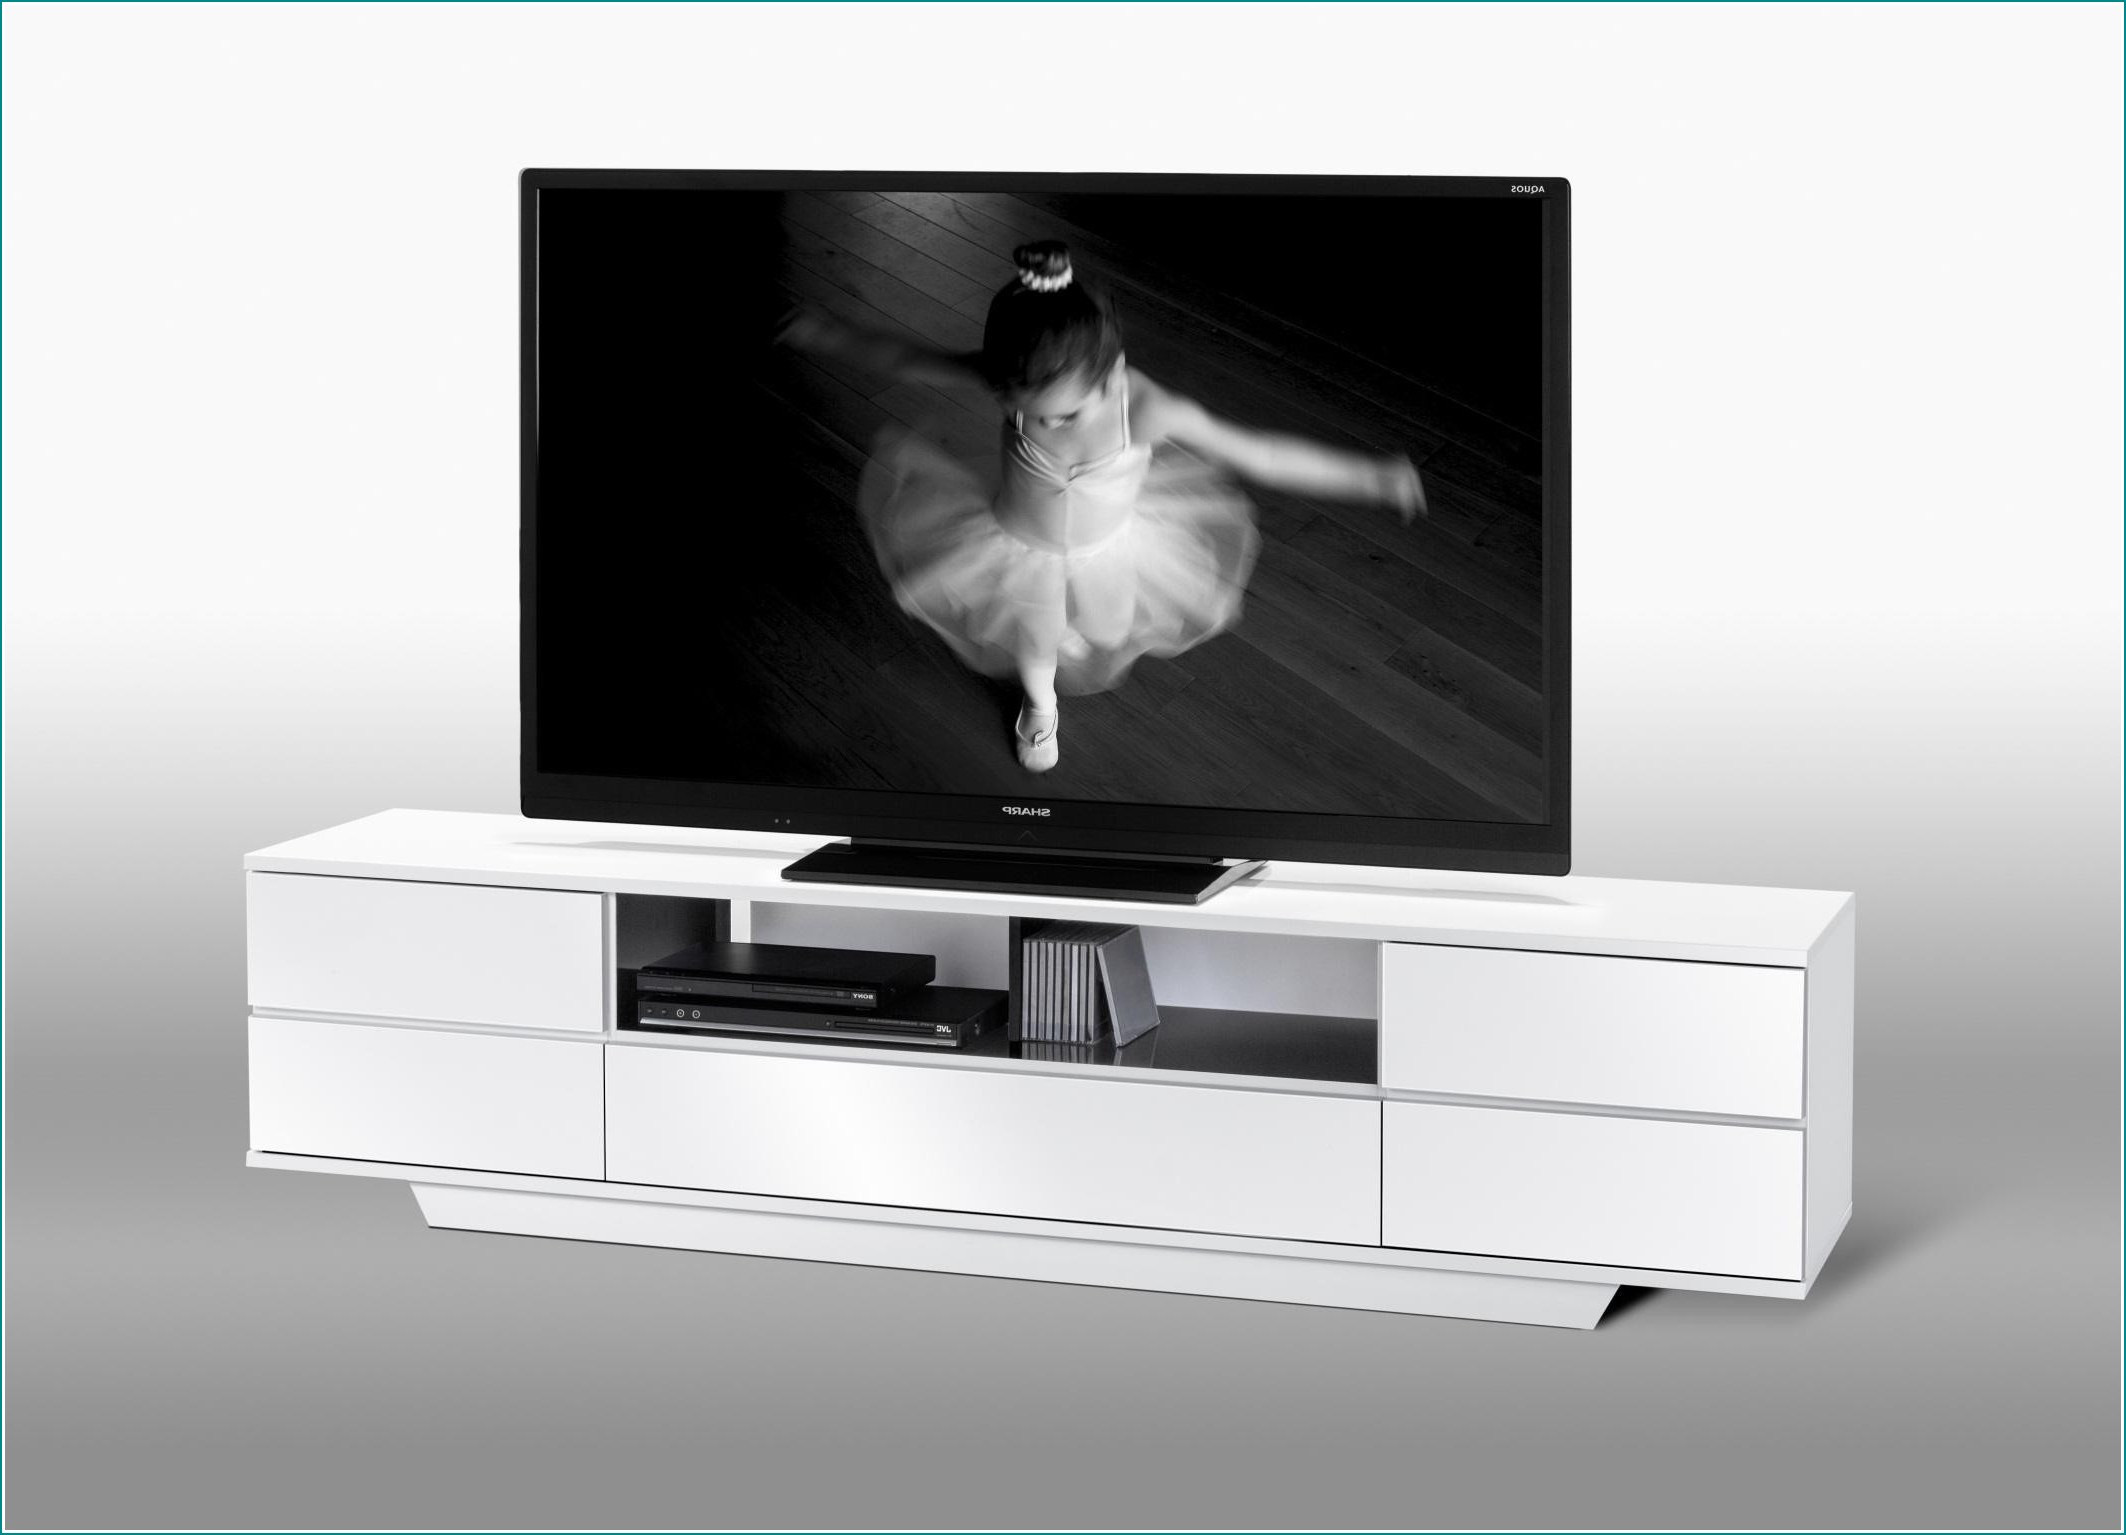 meuble tv led ikea ikea meuble tv lack blanc autre alinea meuble tele meuble tv besta of meuble tv led ikea 1